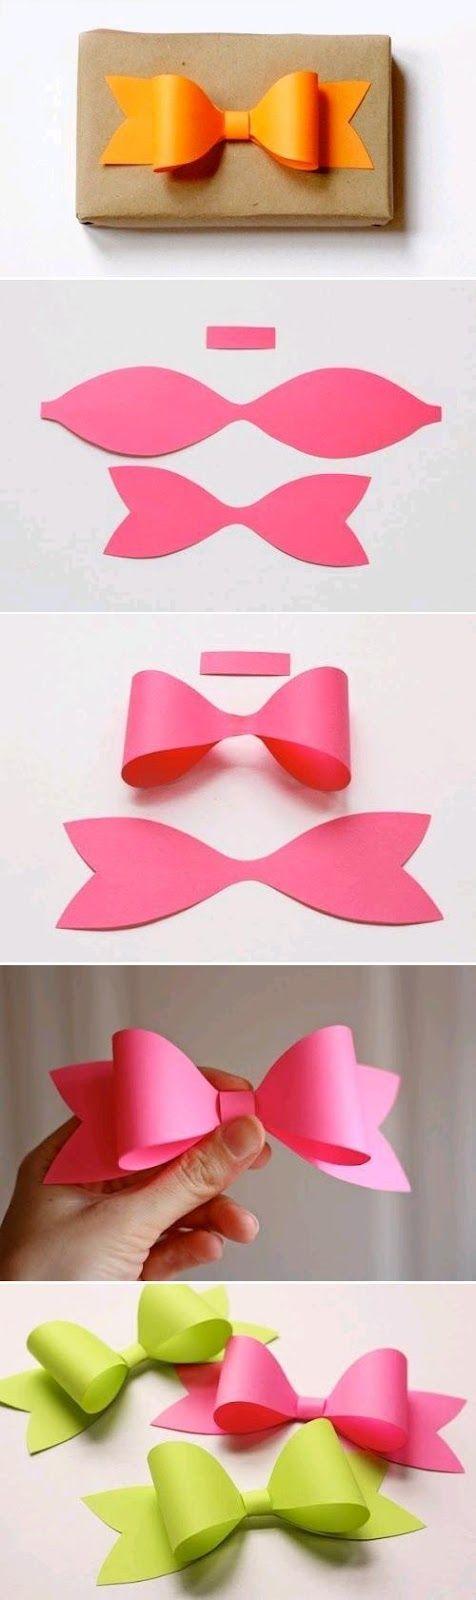 joybobo: Very Simple Modular Gift Bow